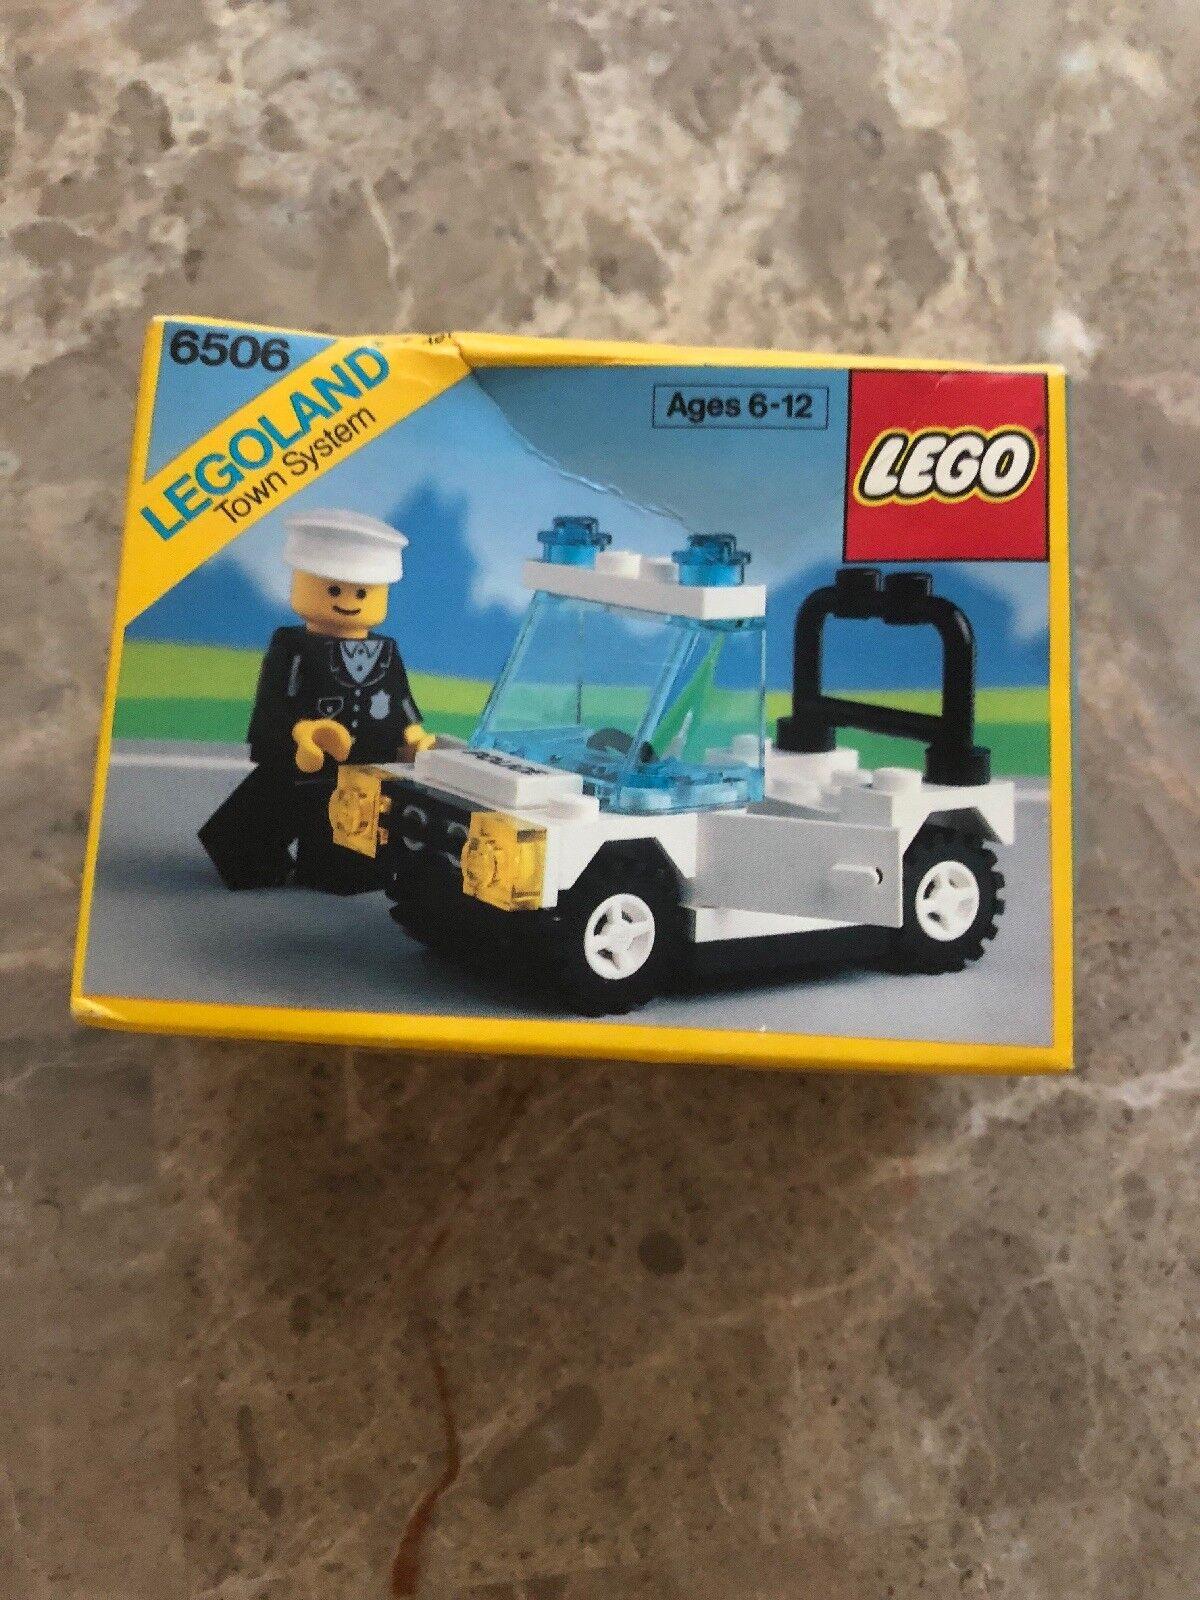 Lego legoland Town Syatem  6506 Precinct Cruiser 1989 NIB RARE Vintage